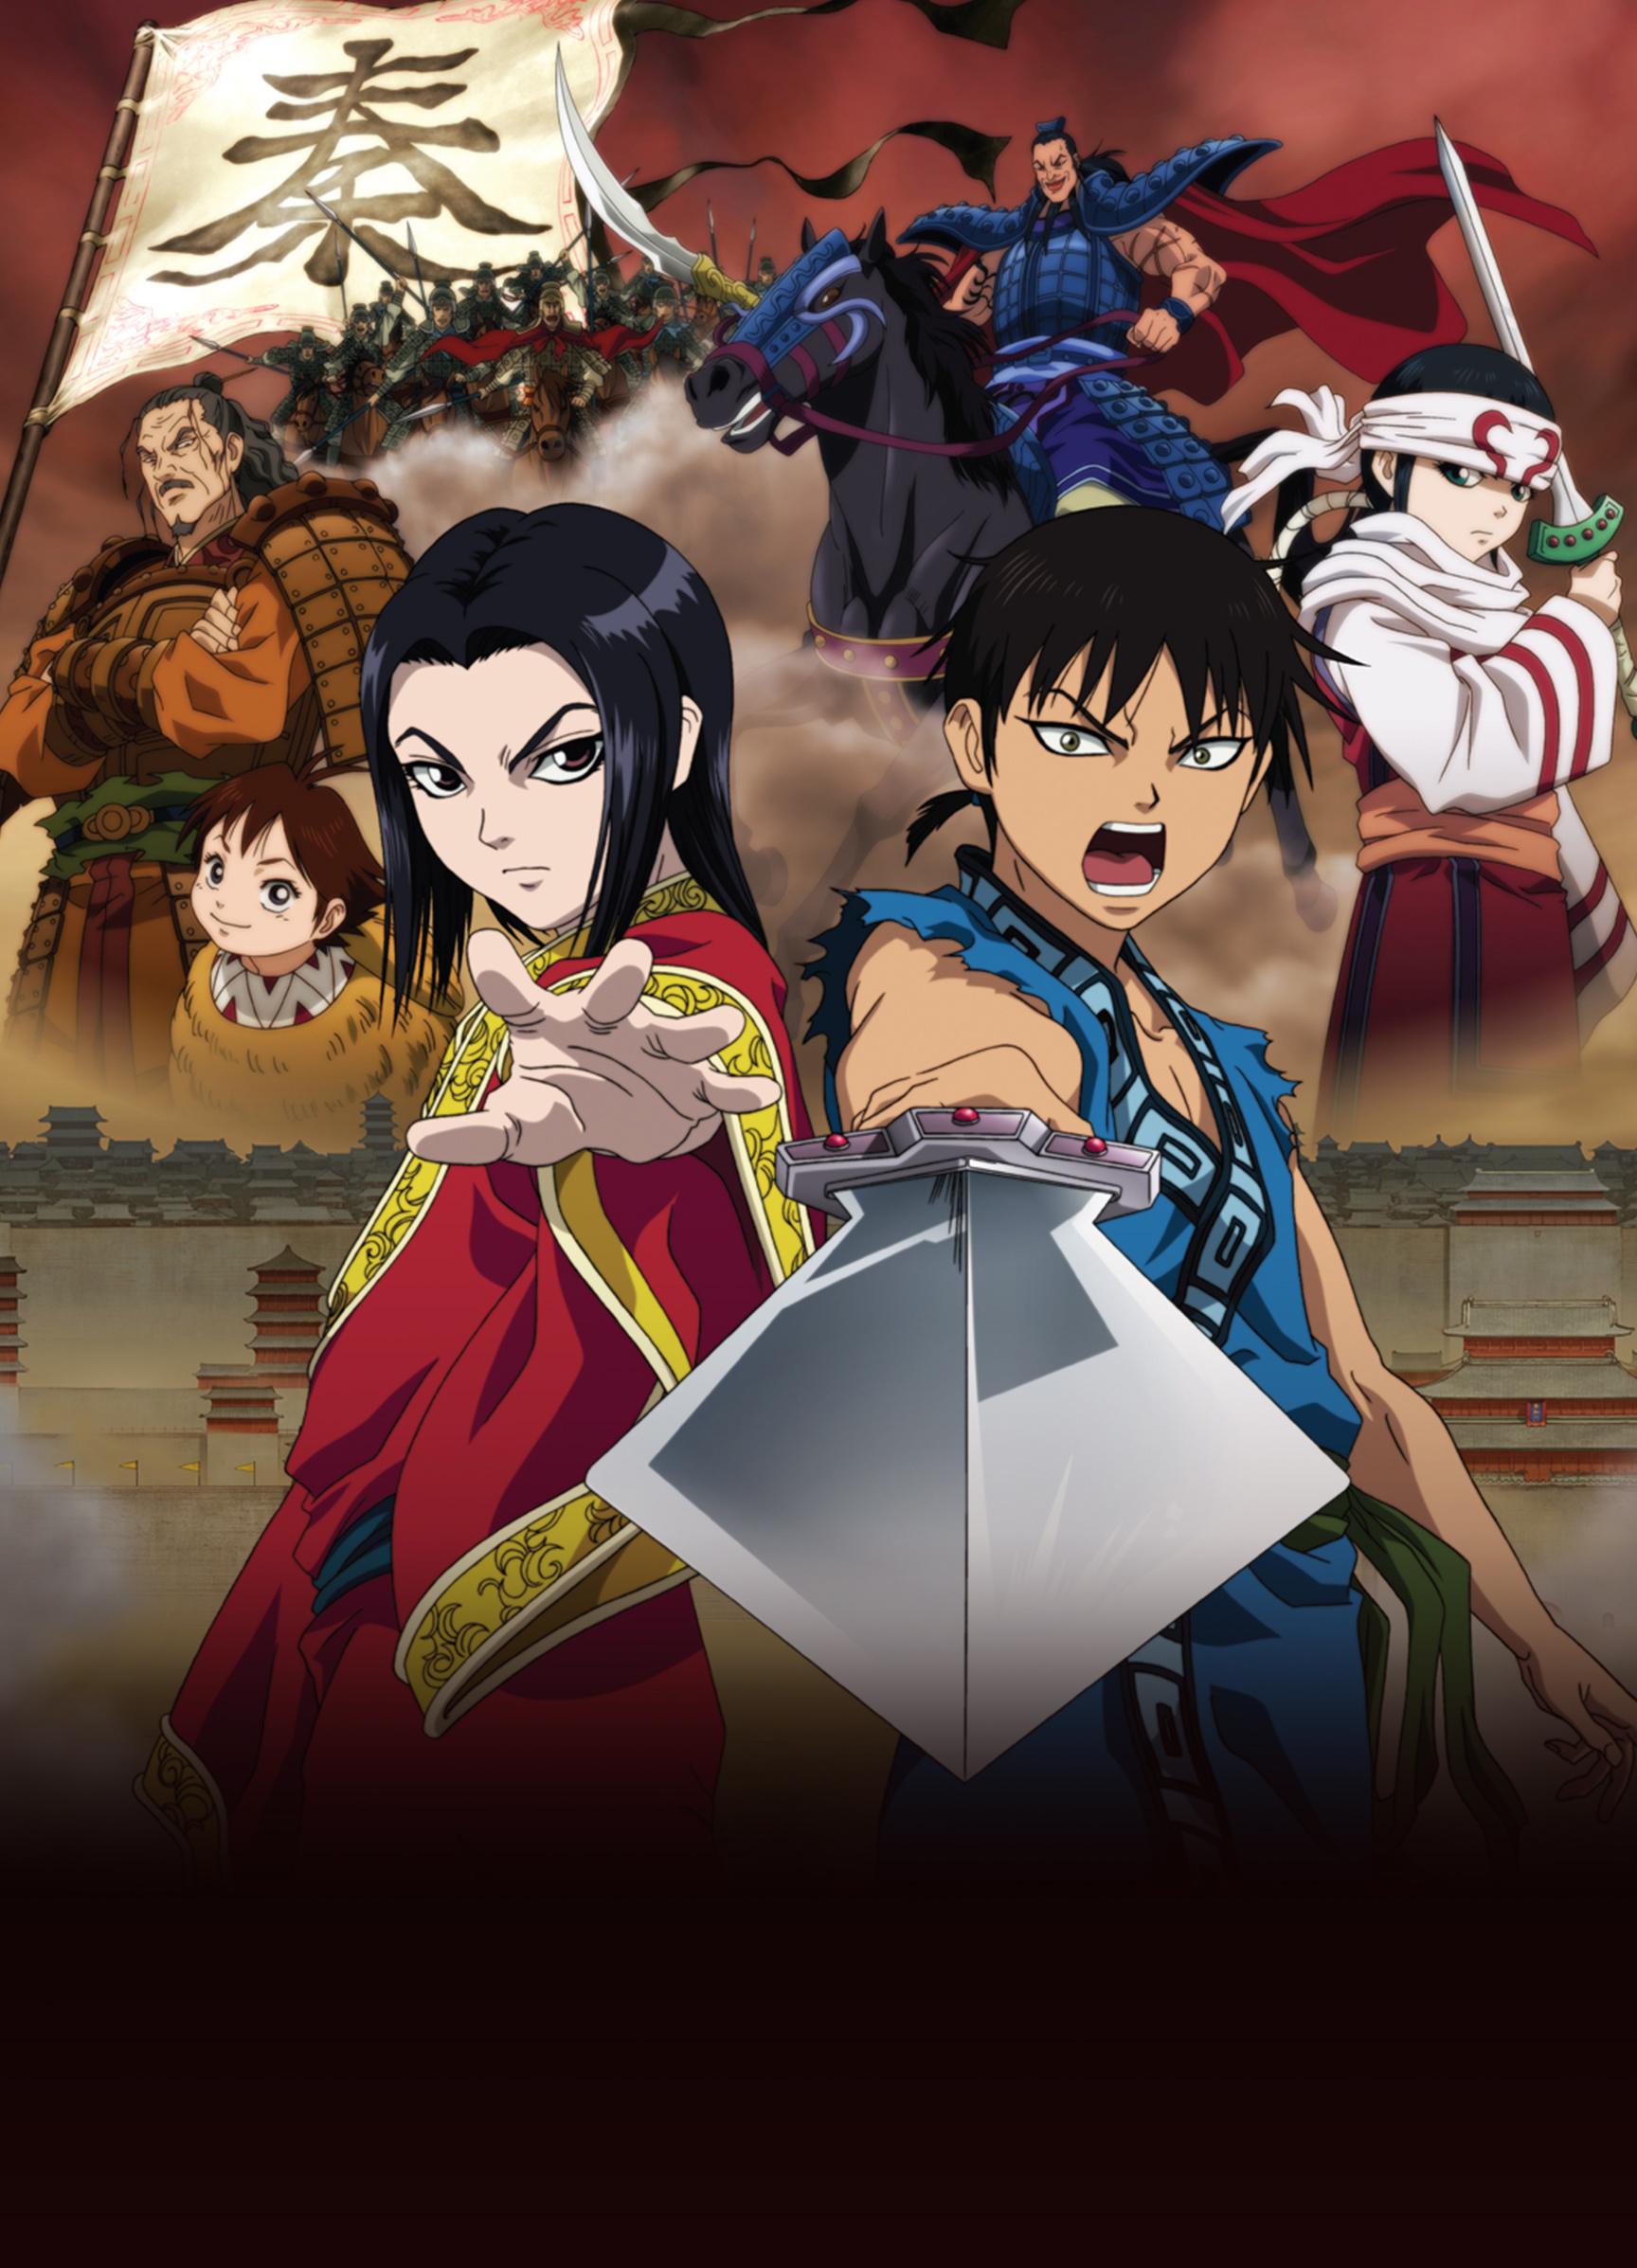 Watch Kingdom Episodes Sub & Dub   Action/Adventure, Fantasy Anime